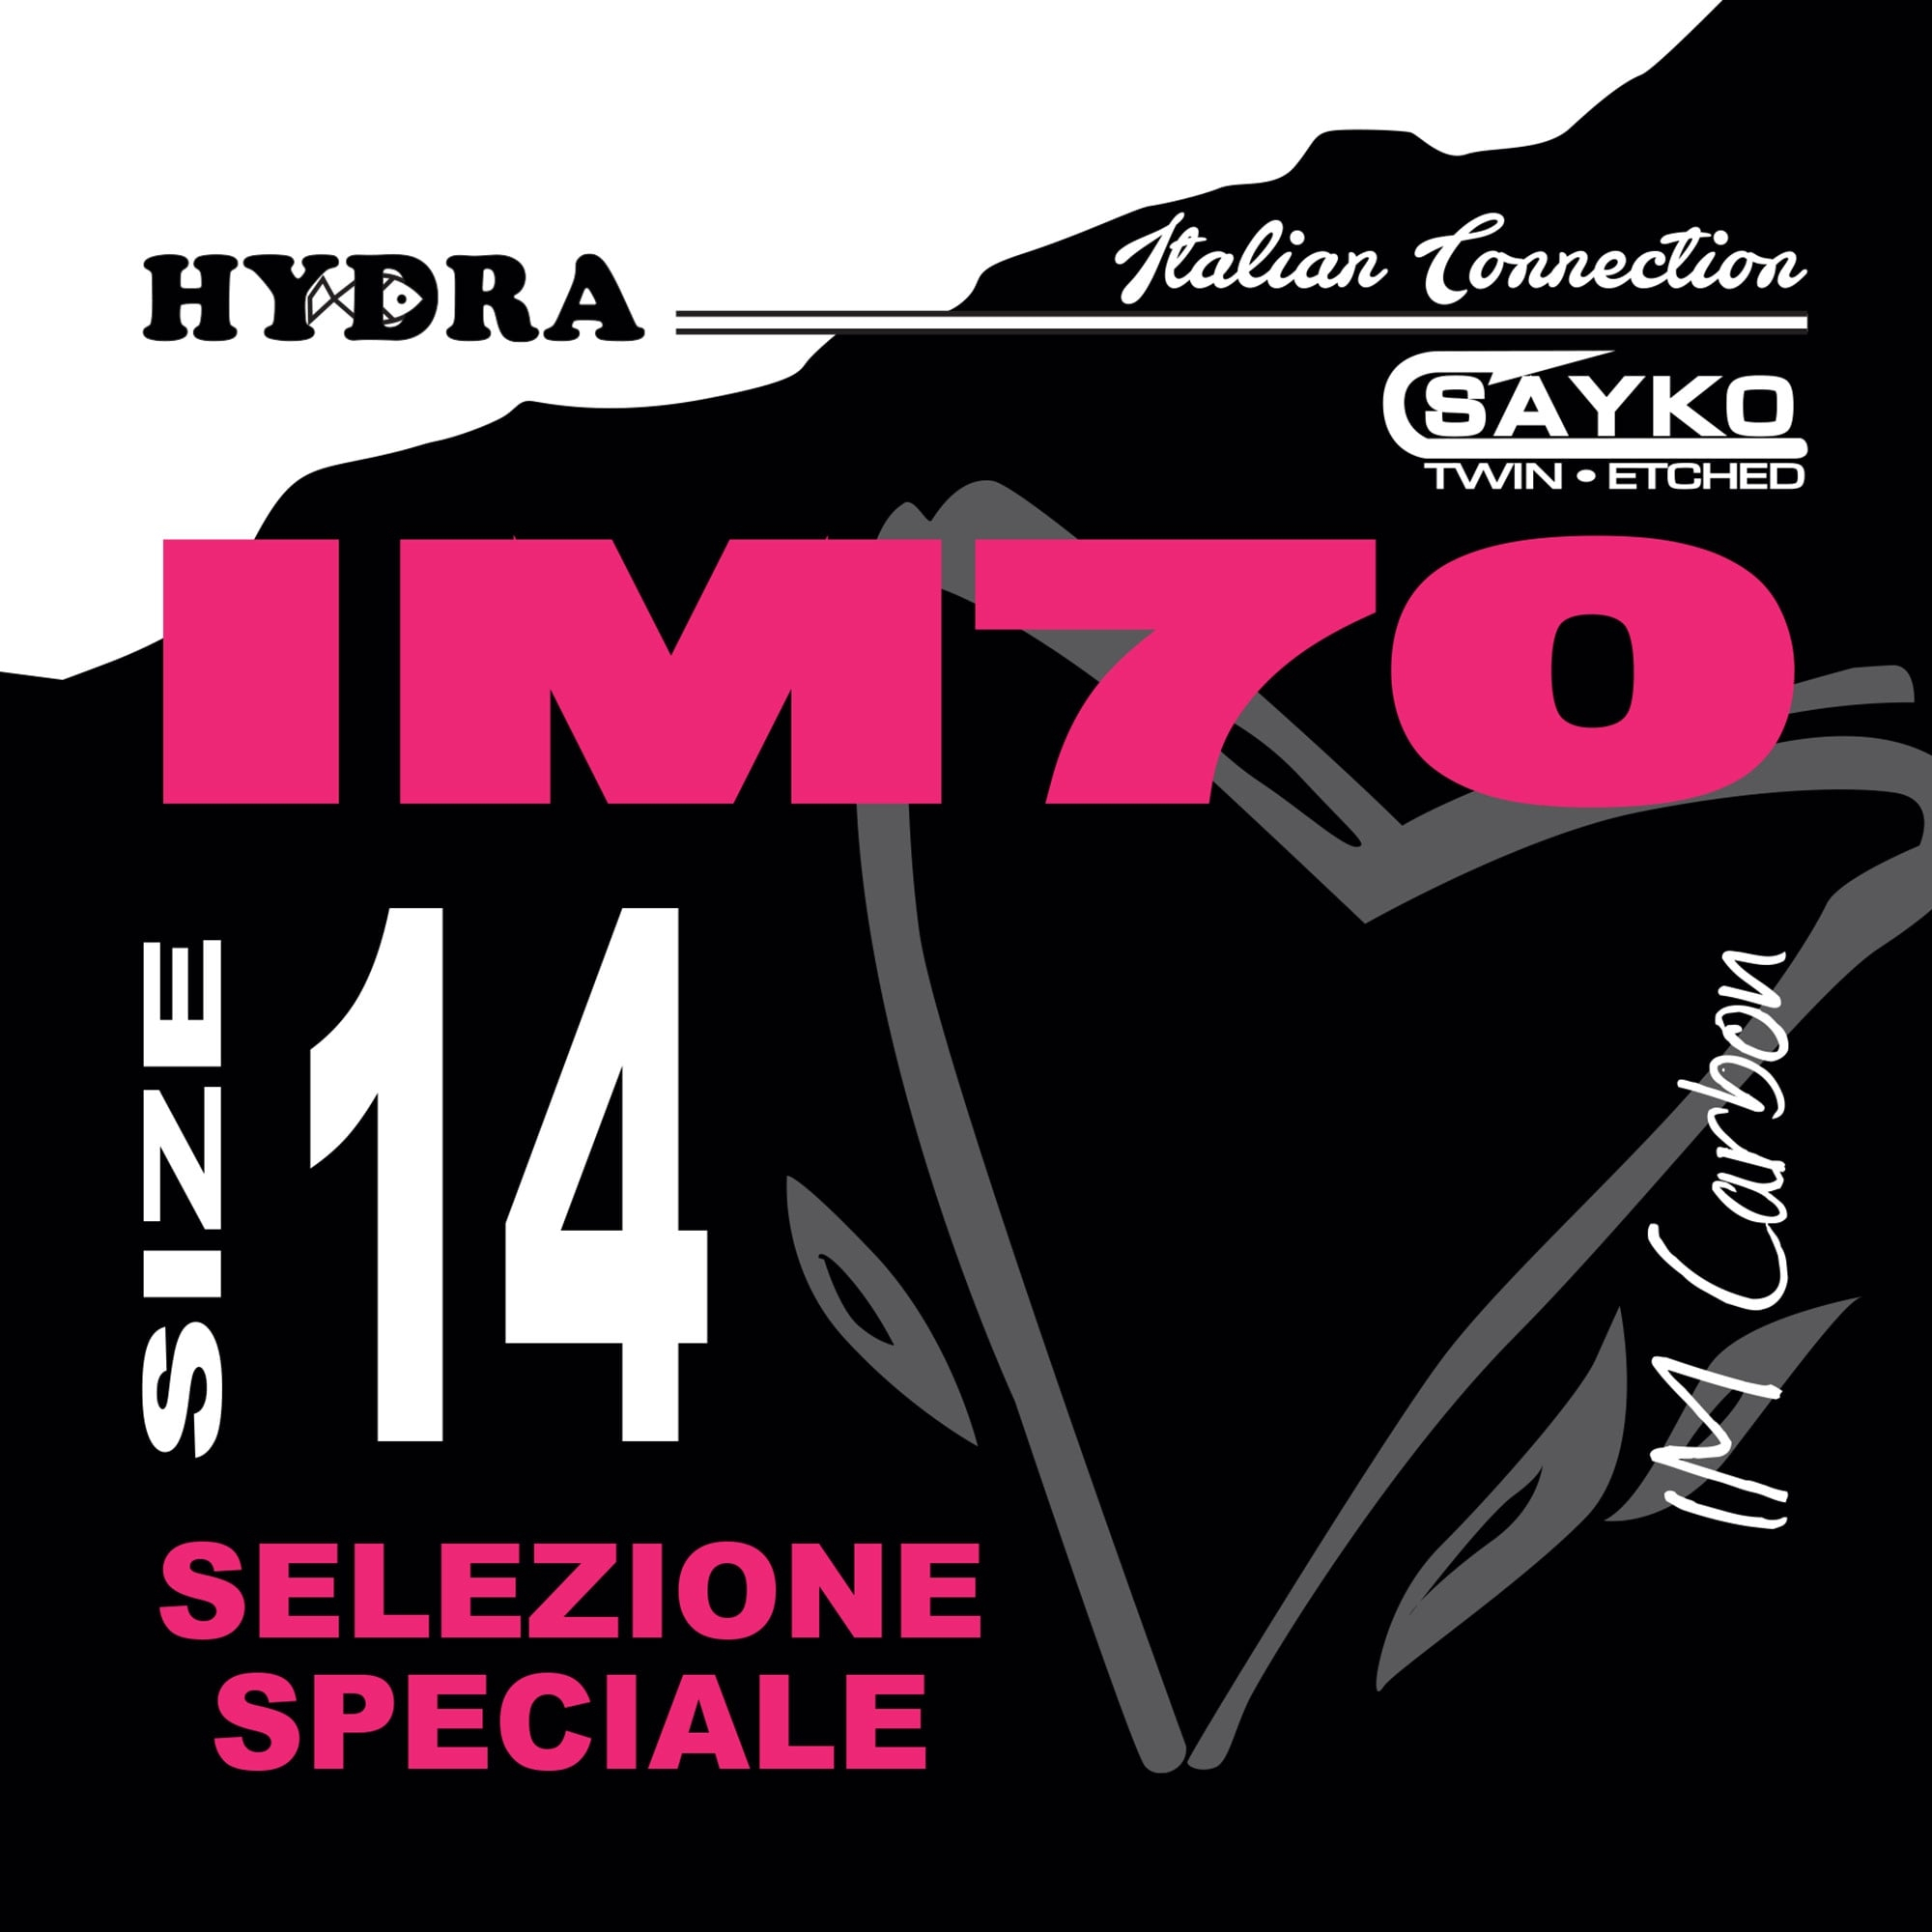 AMI HYDRA serie IM70 Nichelato (20pz)